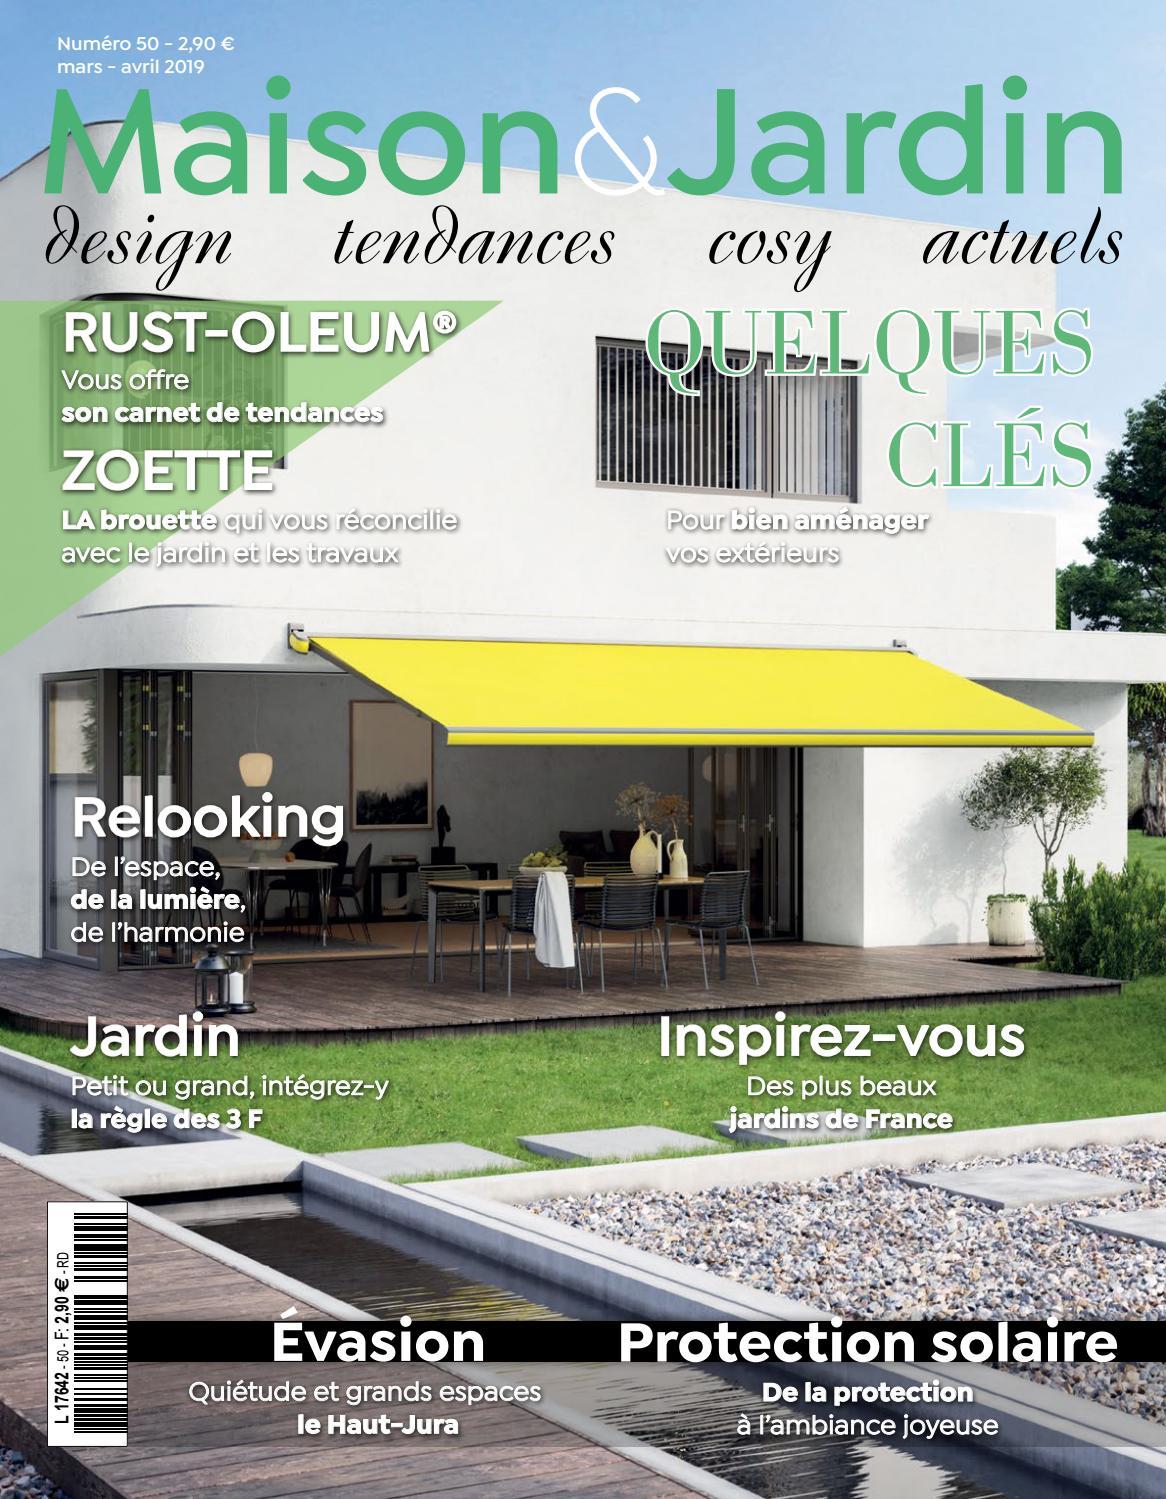 Maison Et Jardin Mars Avril 2019 By Spmediacom - Issuu concernant Idée De Génie Jardin